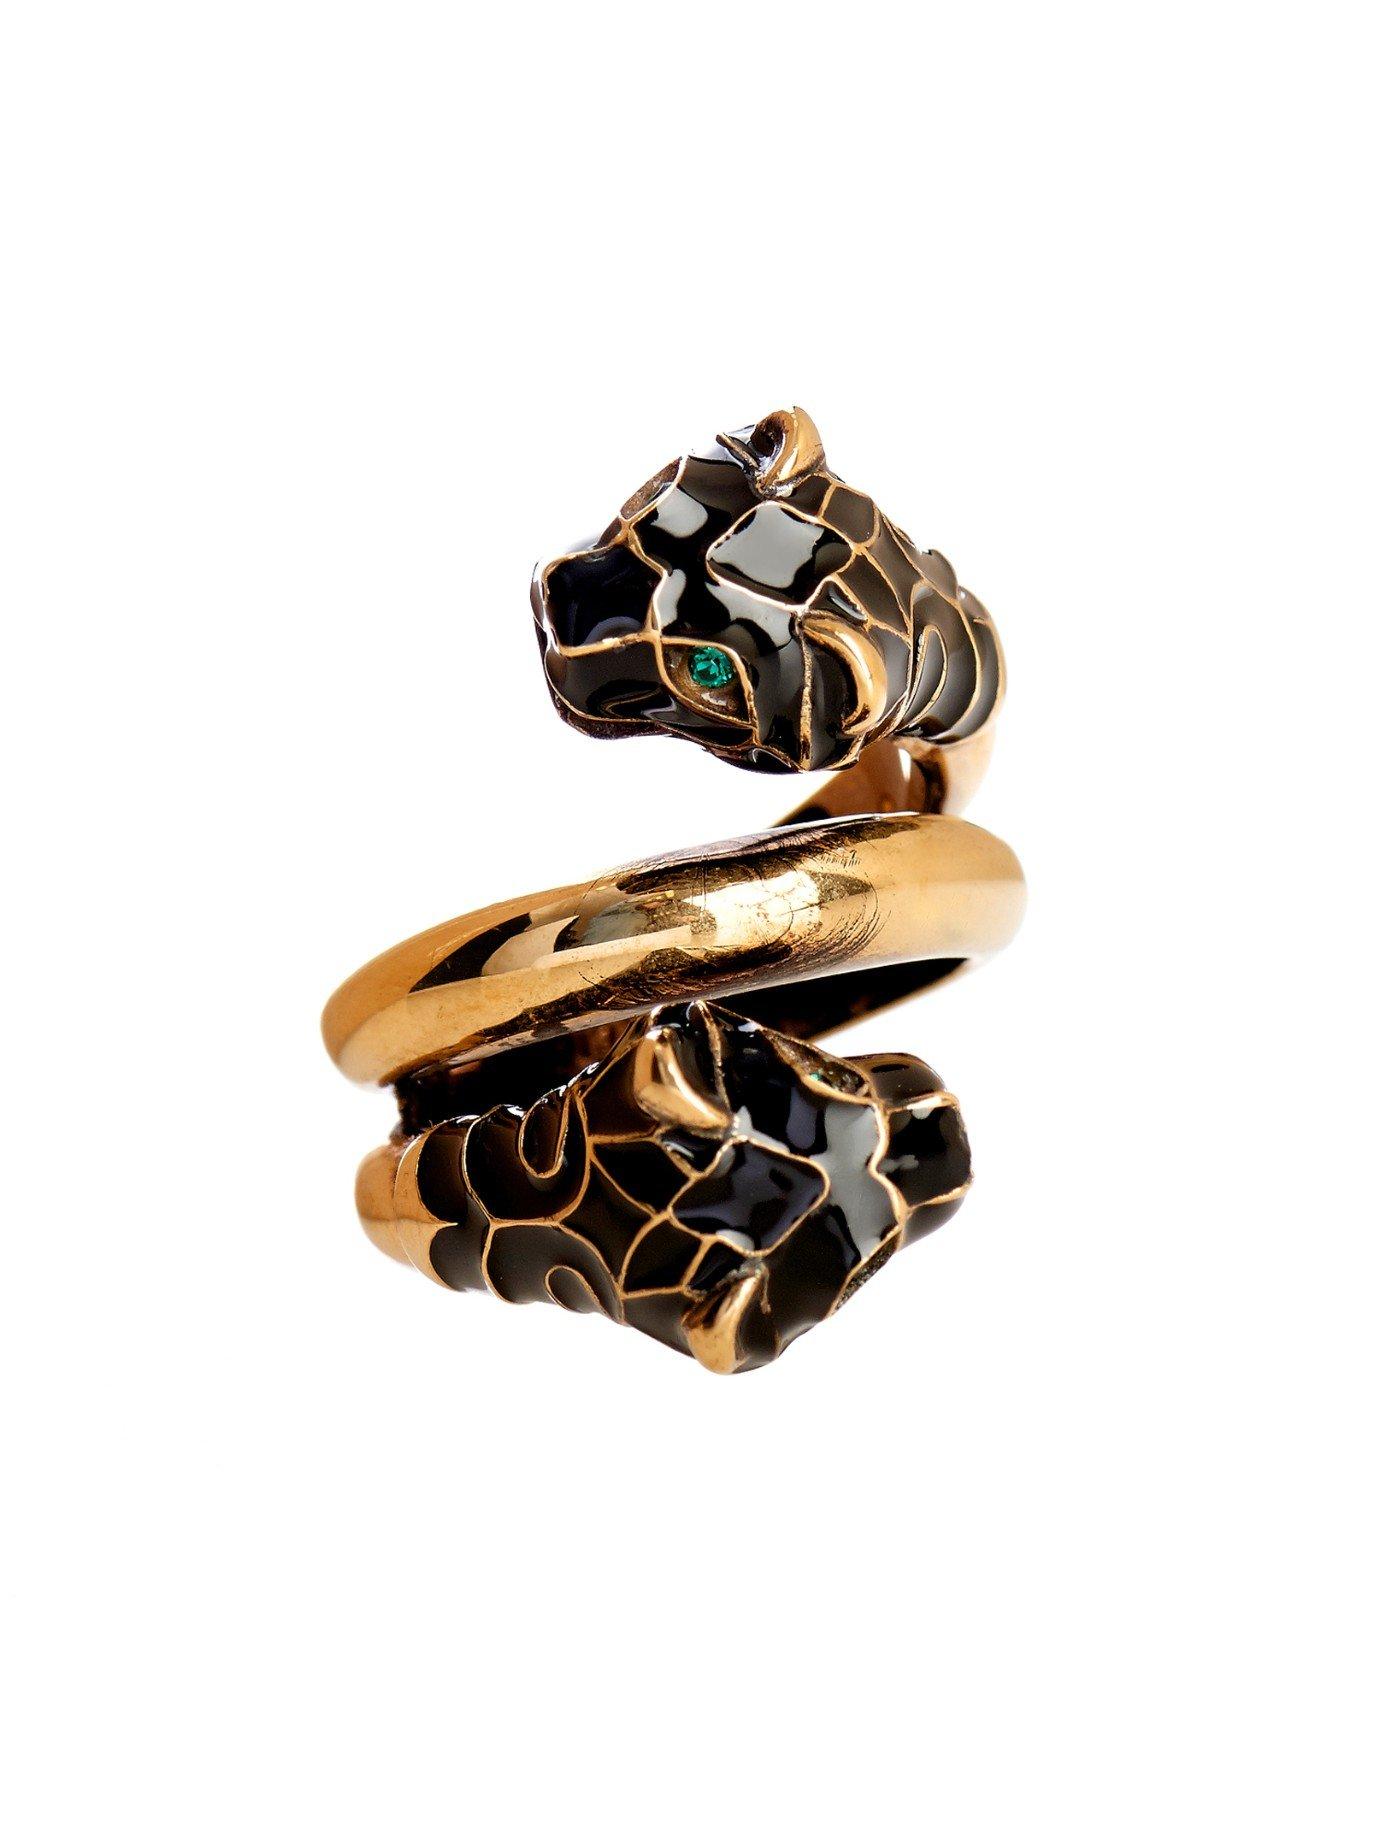 Antique Gold Emerald Ring